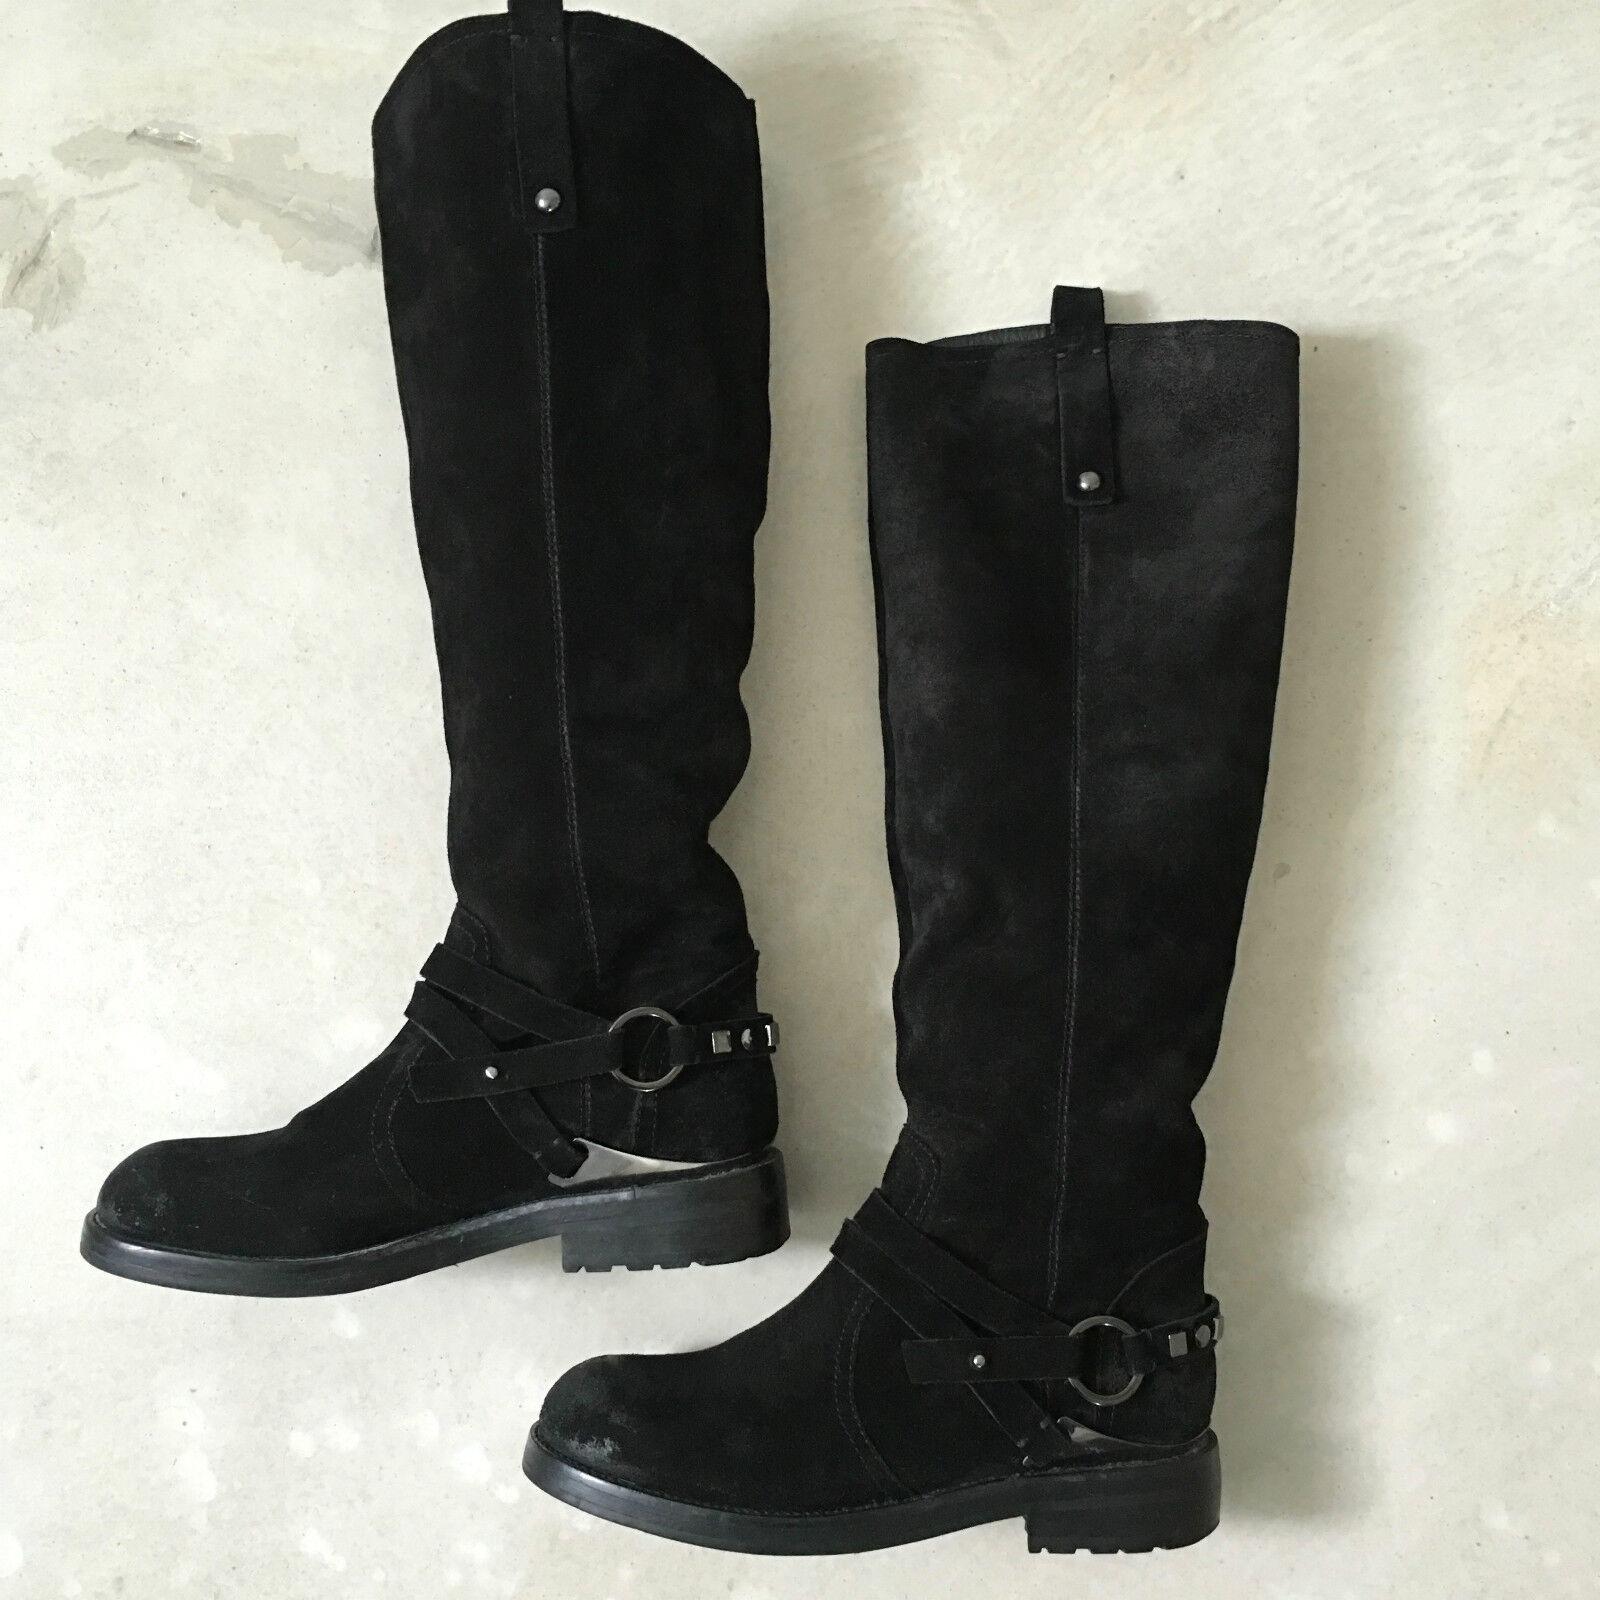 Stiefel Leder, aus Leder, Stiefel Damen, Größe 38, Schwarz 7cce39